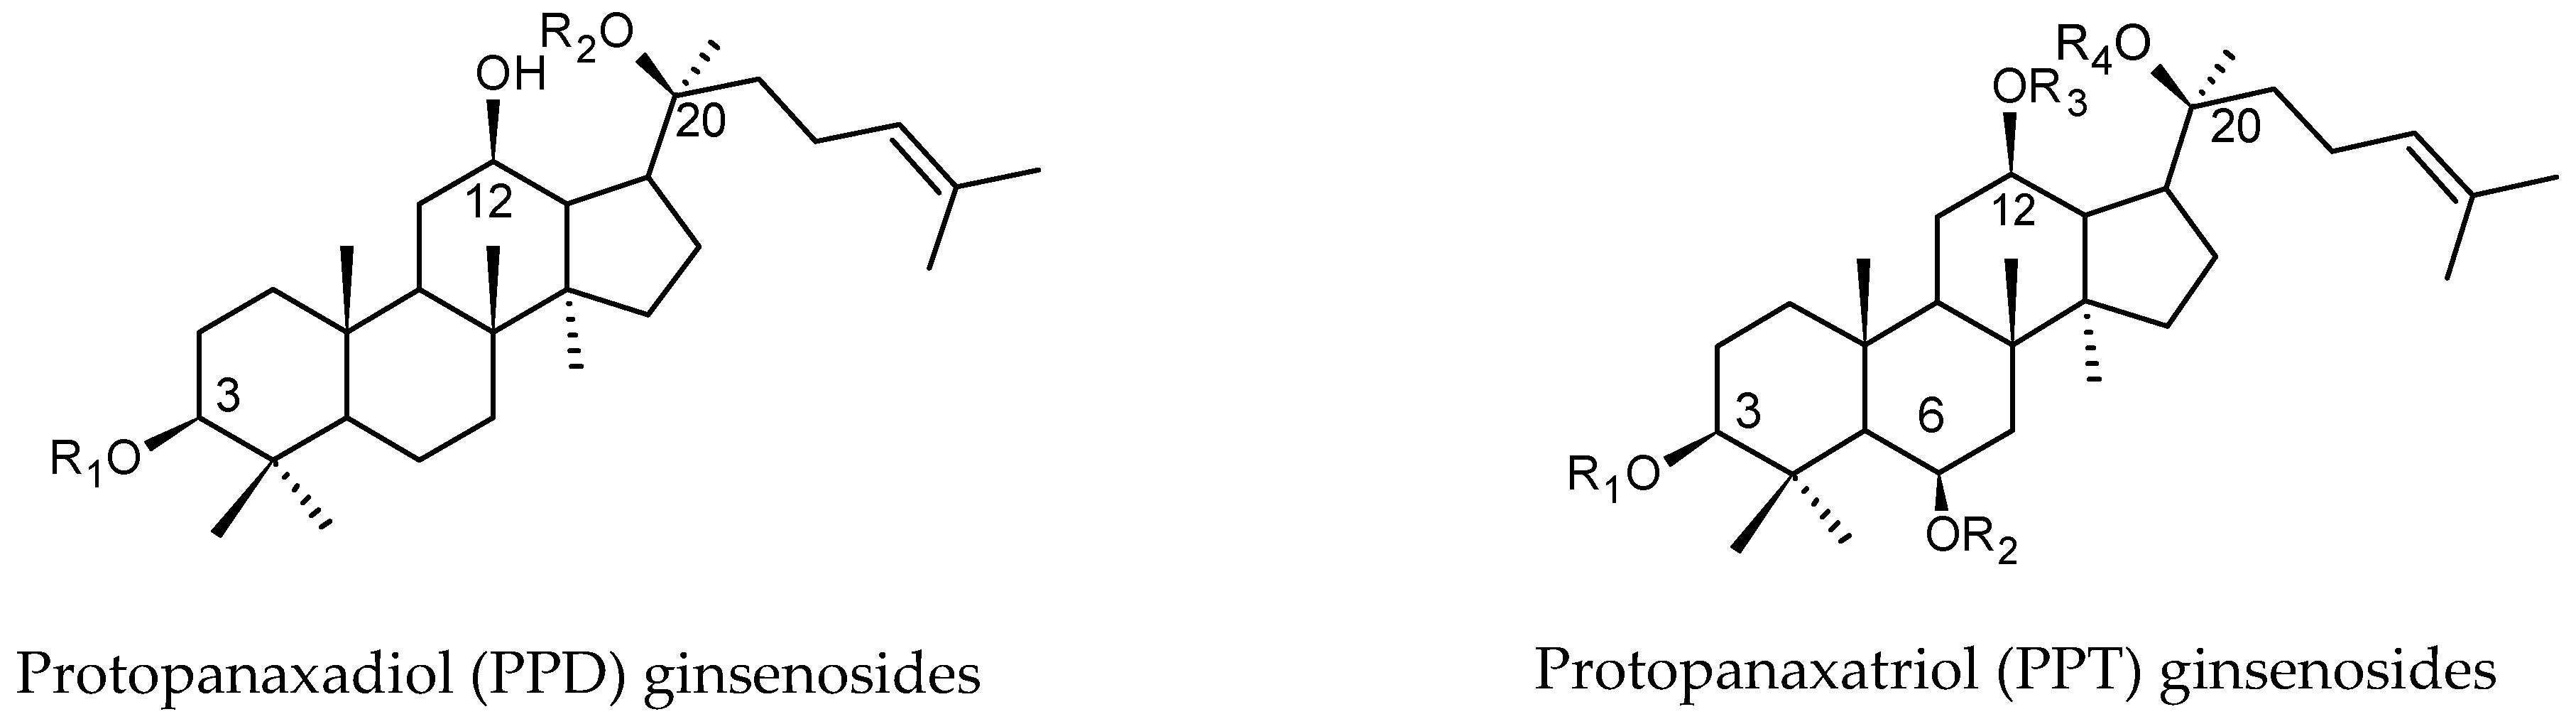 Molecules 24 01856 g001